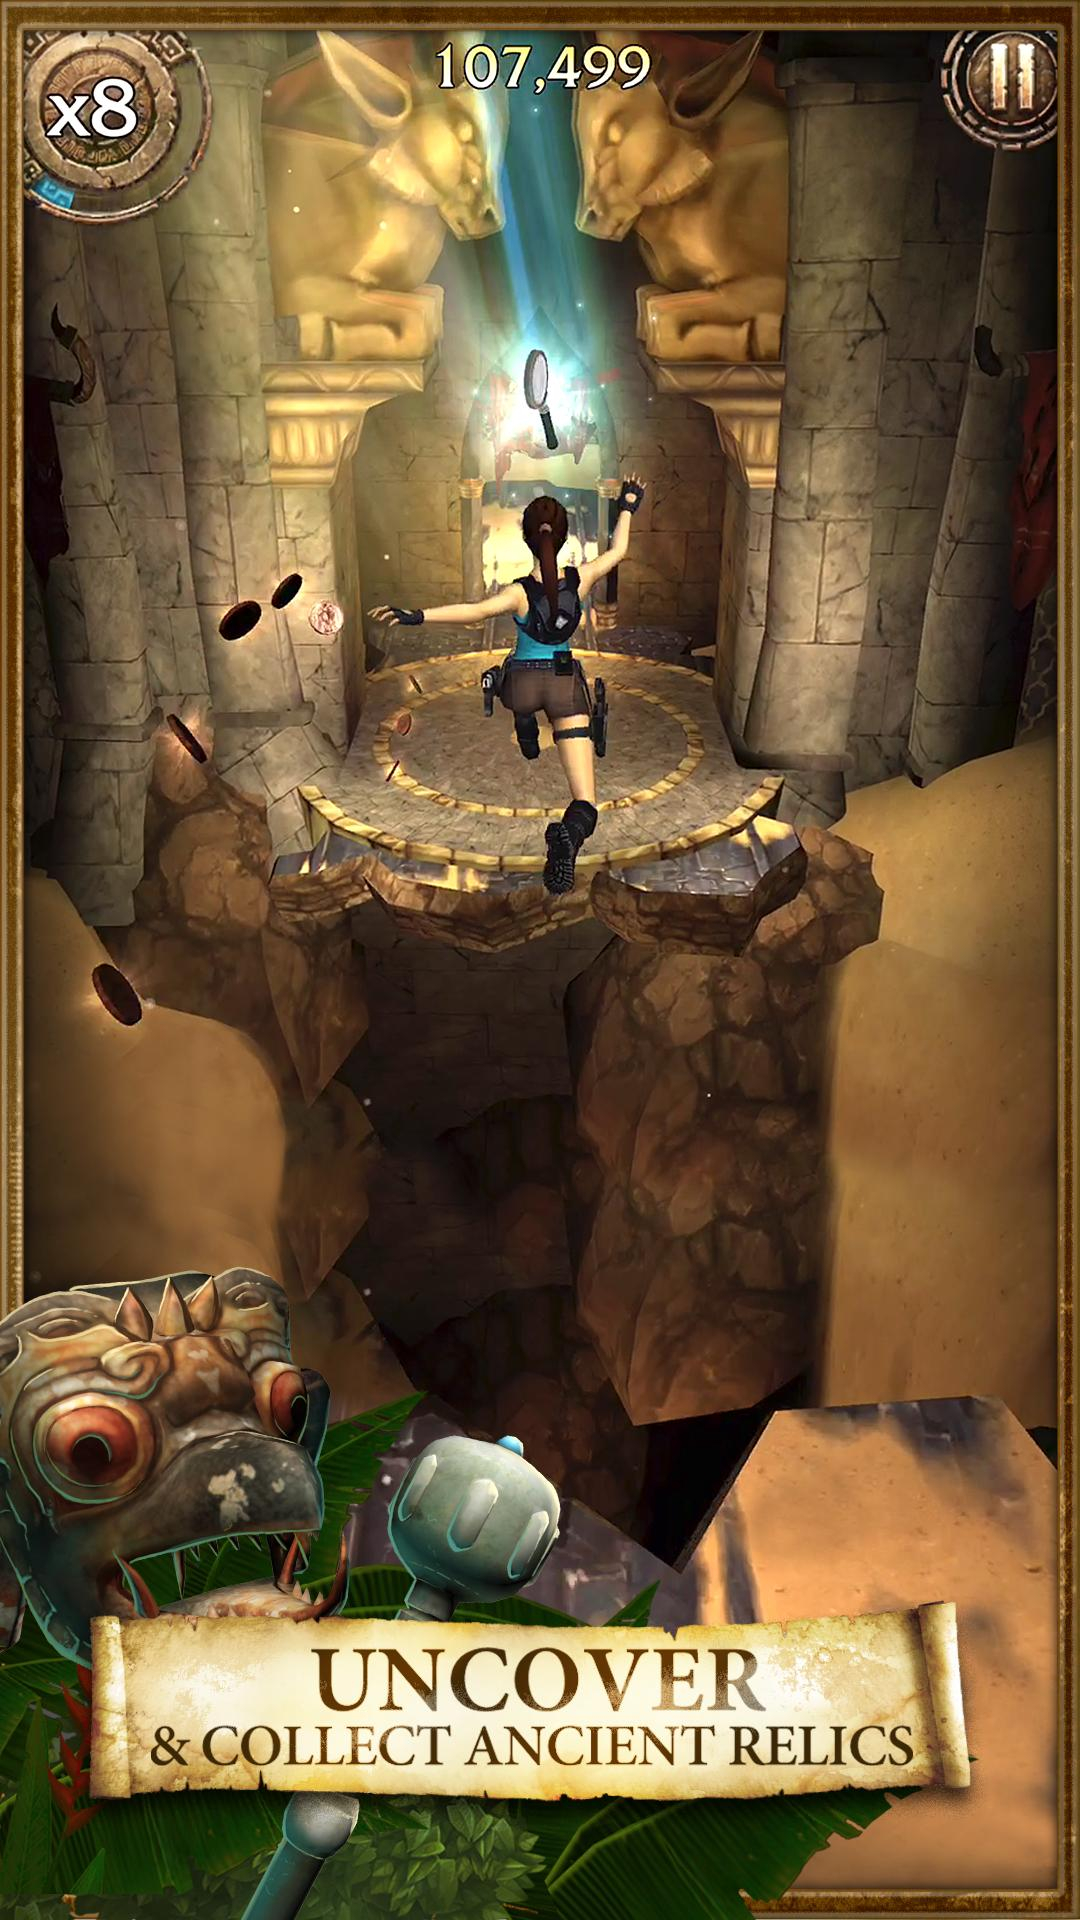 Lara Croft: Relic Run 1.11.112 Screenshot 5